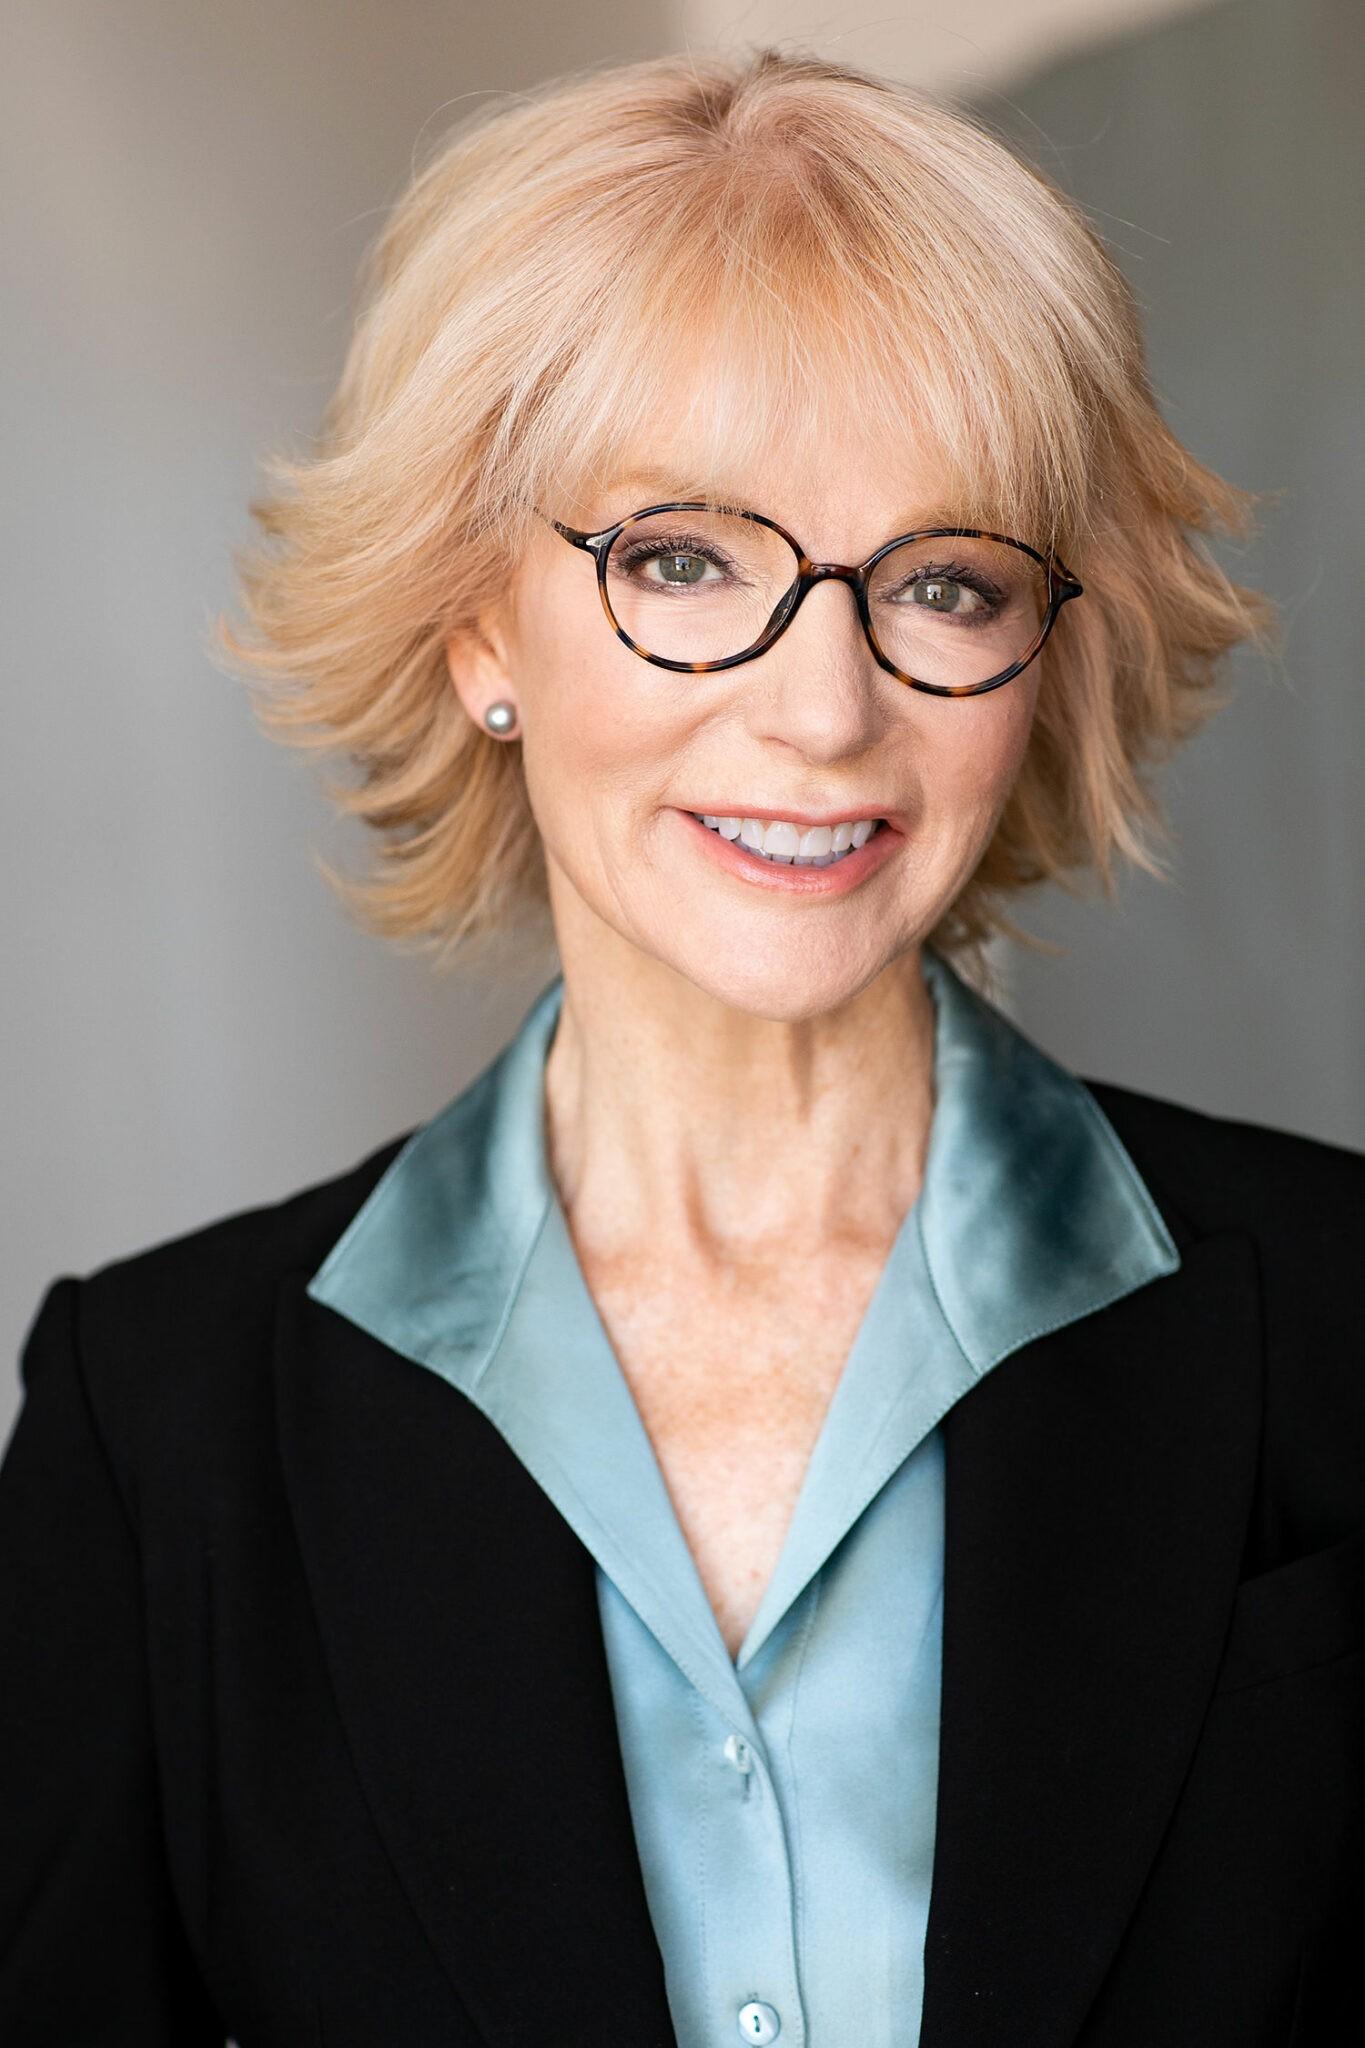 Lynne Delaney